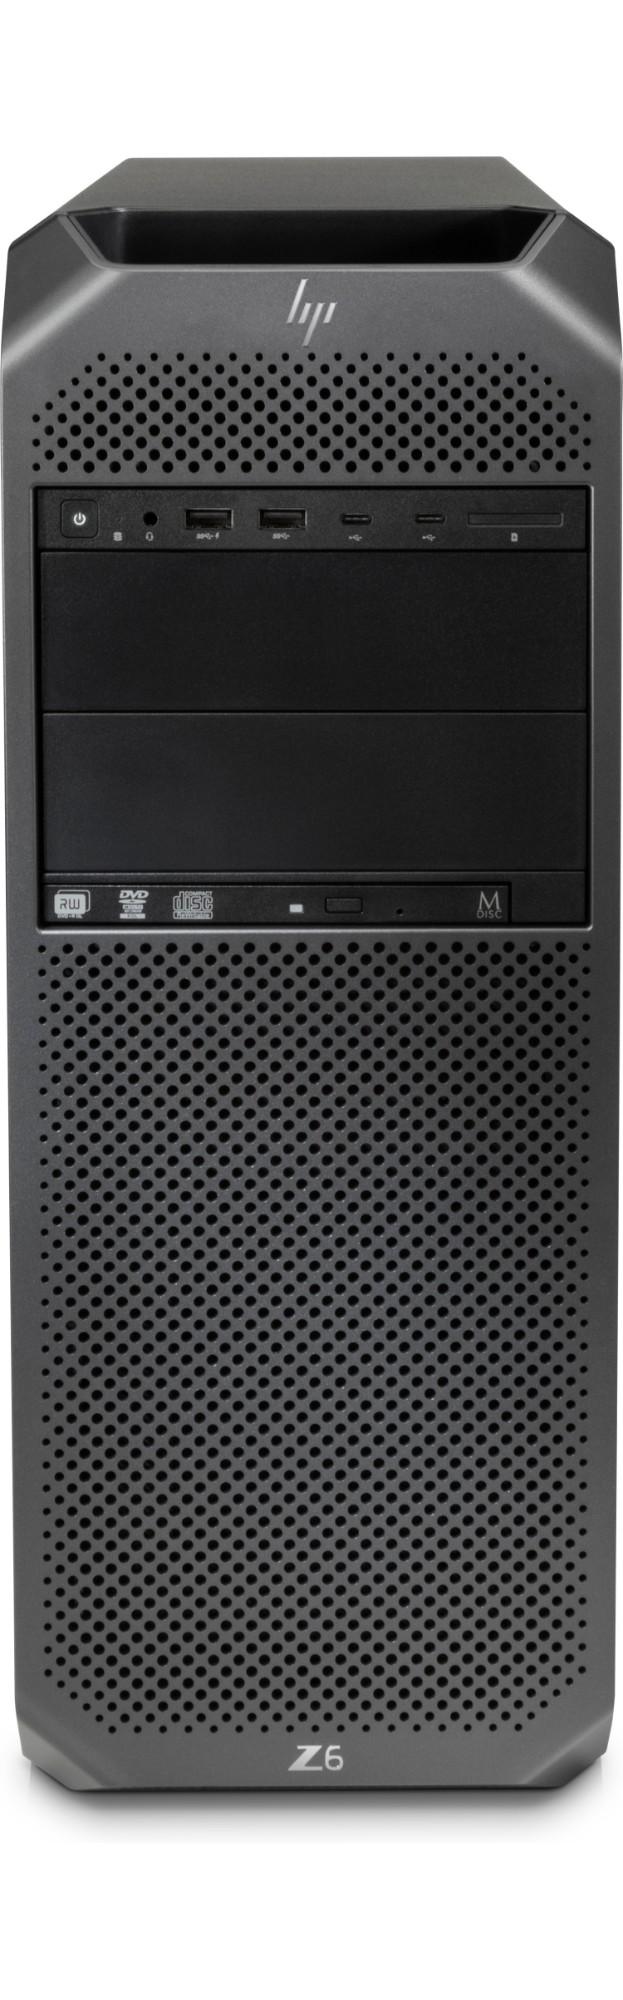 HP Z6 G4 Intel® Xeon® 4108 32 GB DDR4-SDRAM 256 GB SSD Zwart Toren Workstation